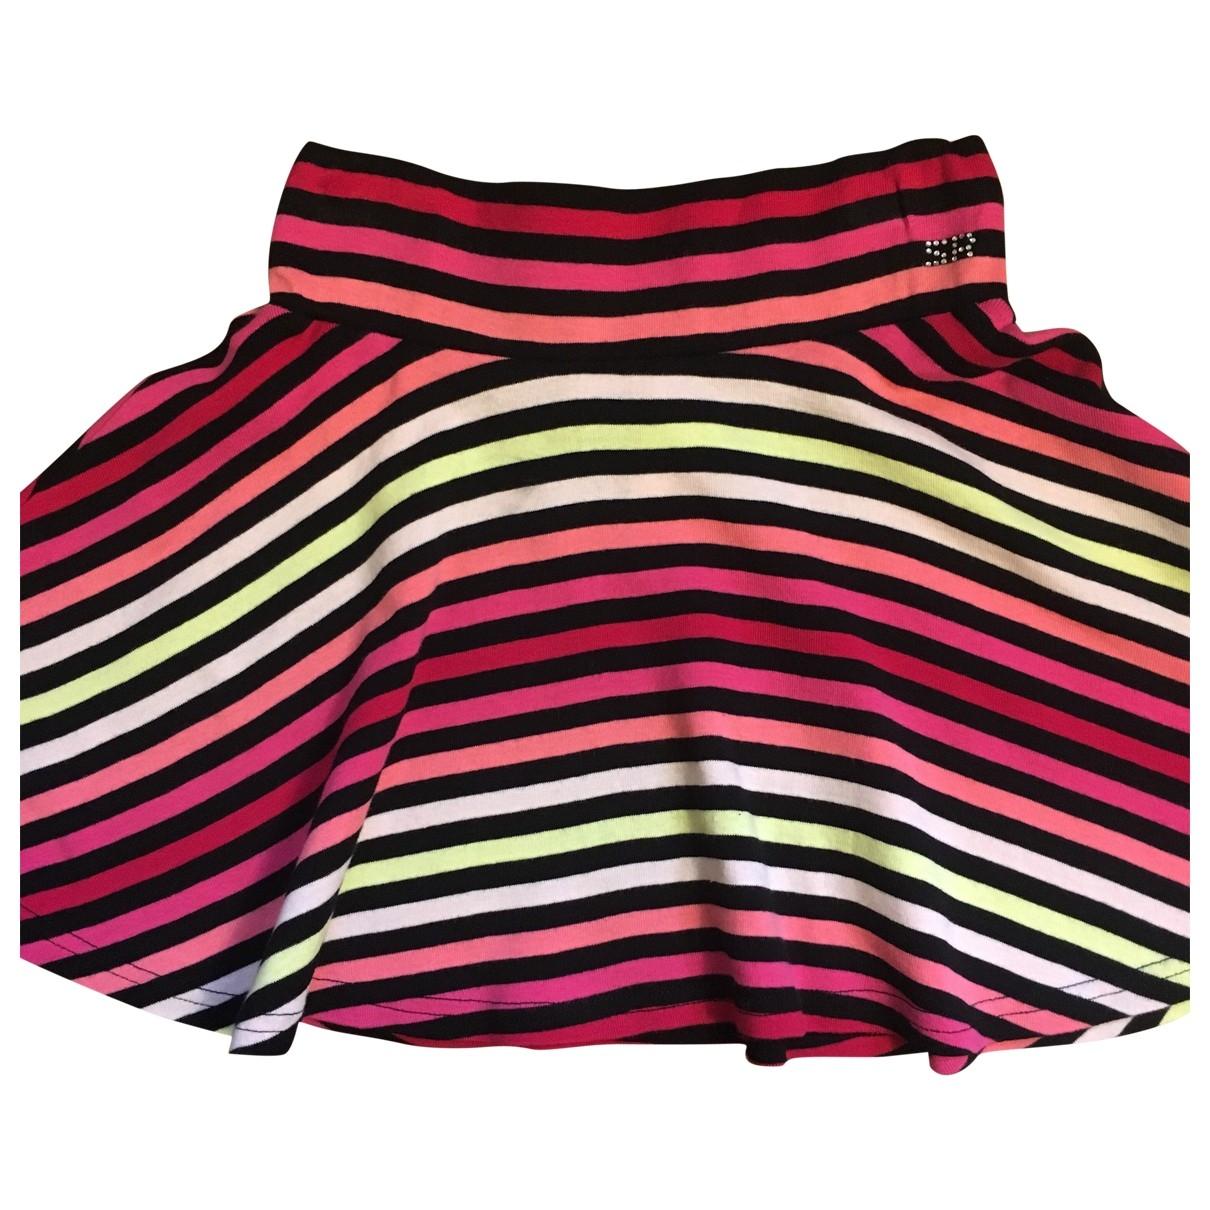 Sonia Rykiel - Jupe   pour enfant en coton - multicolore